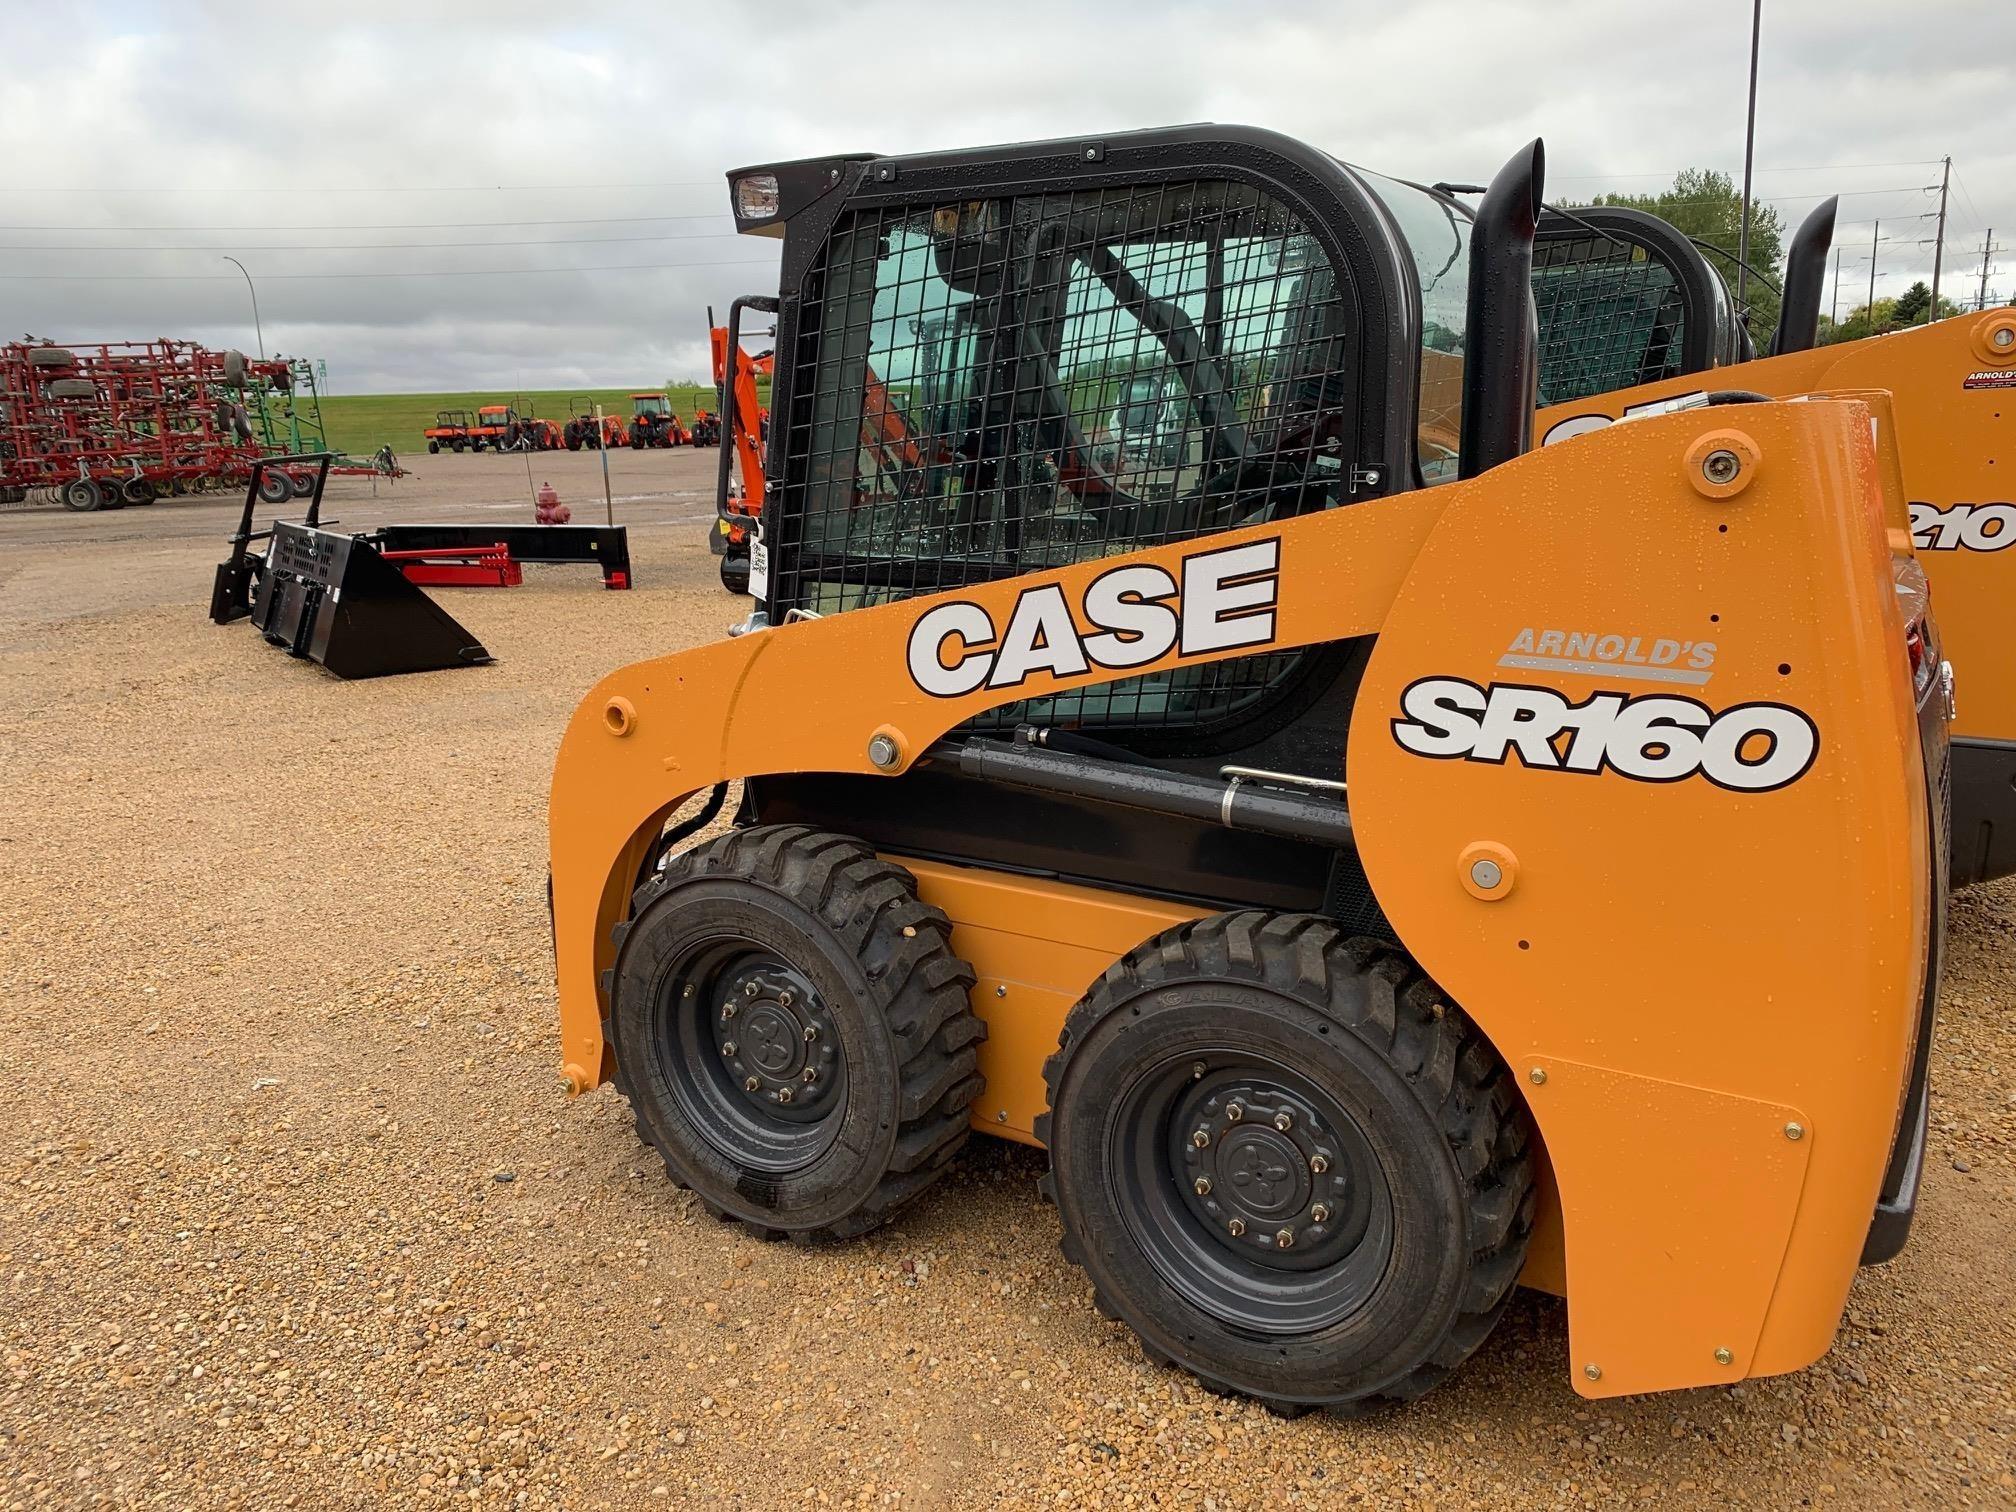 2018 Case SR160 Skid Steer